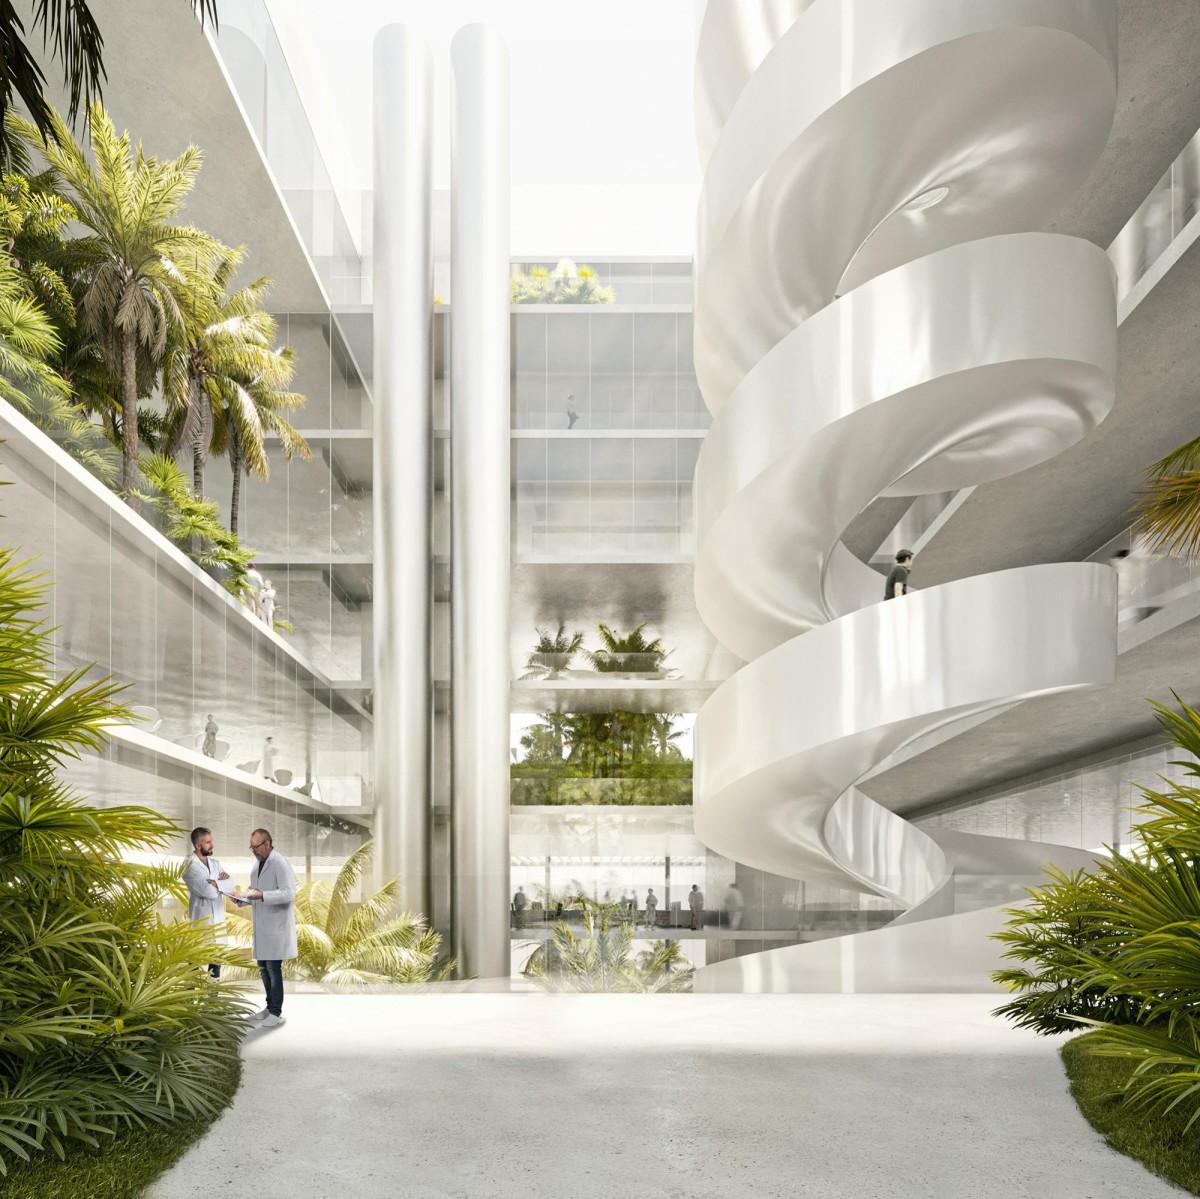 Barozzi Veiga . new BIST building . Barcelona afasia (4)